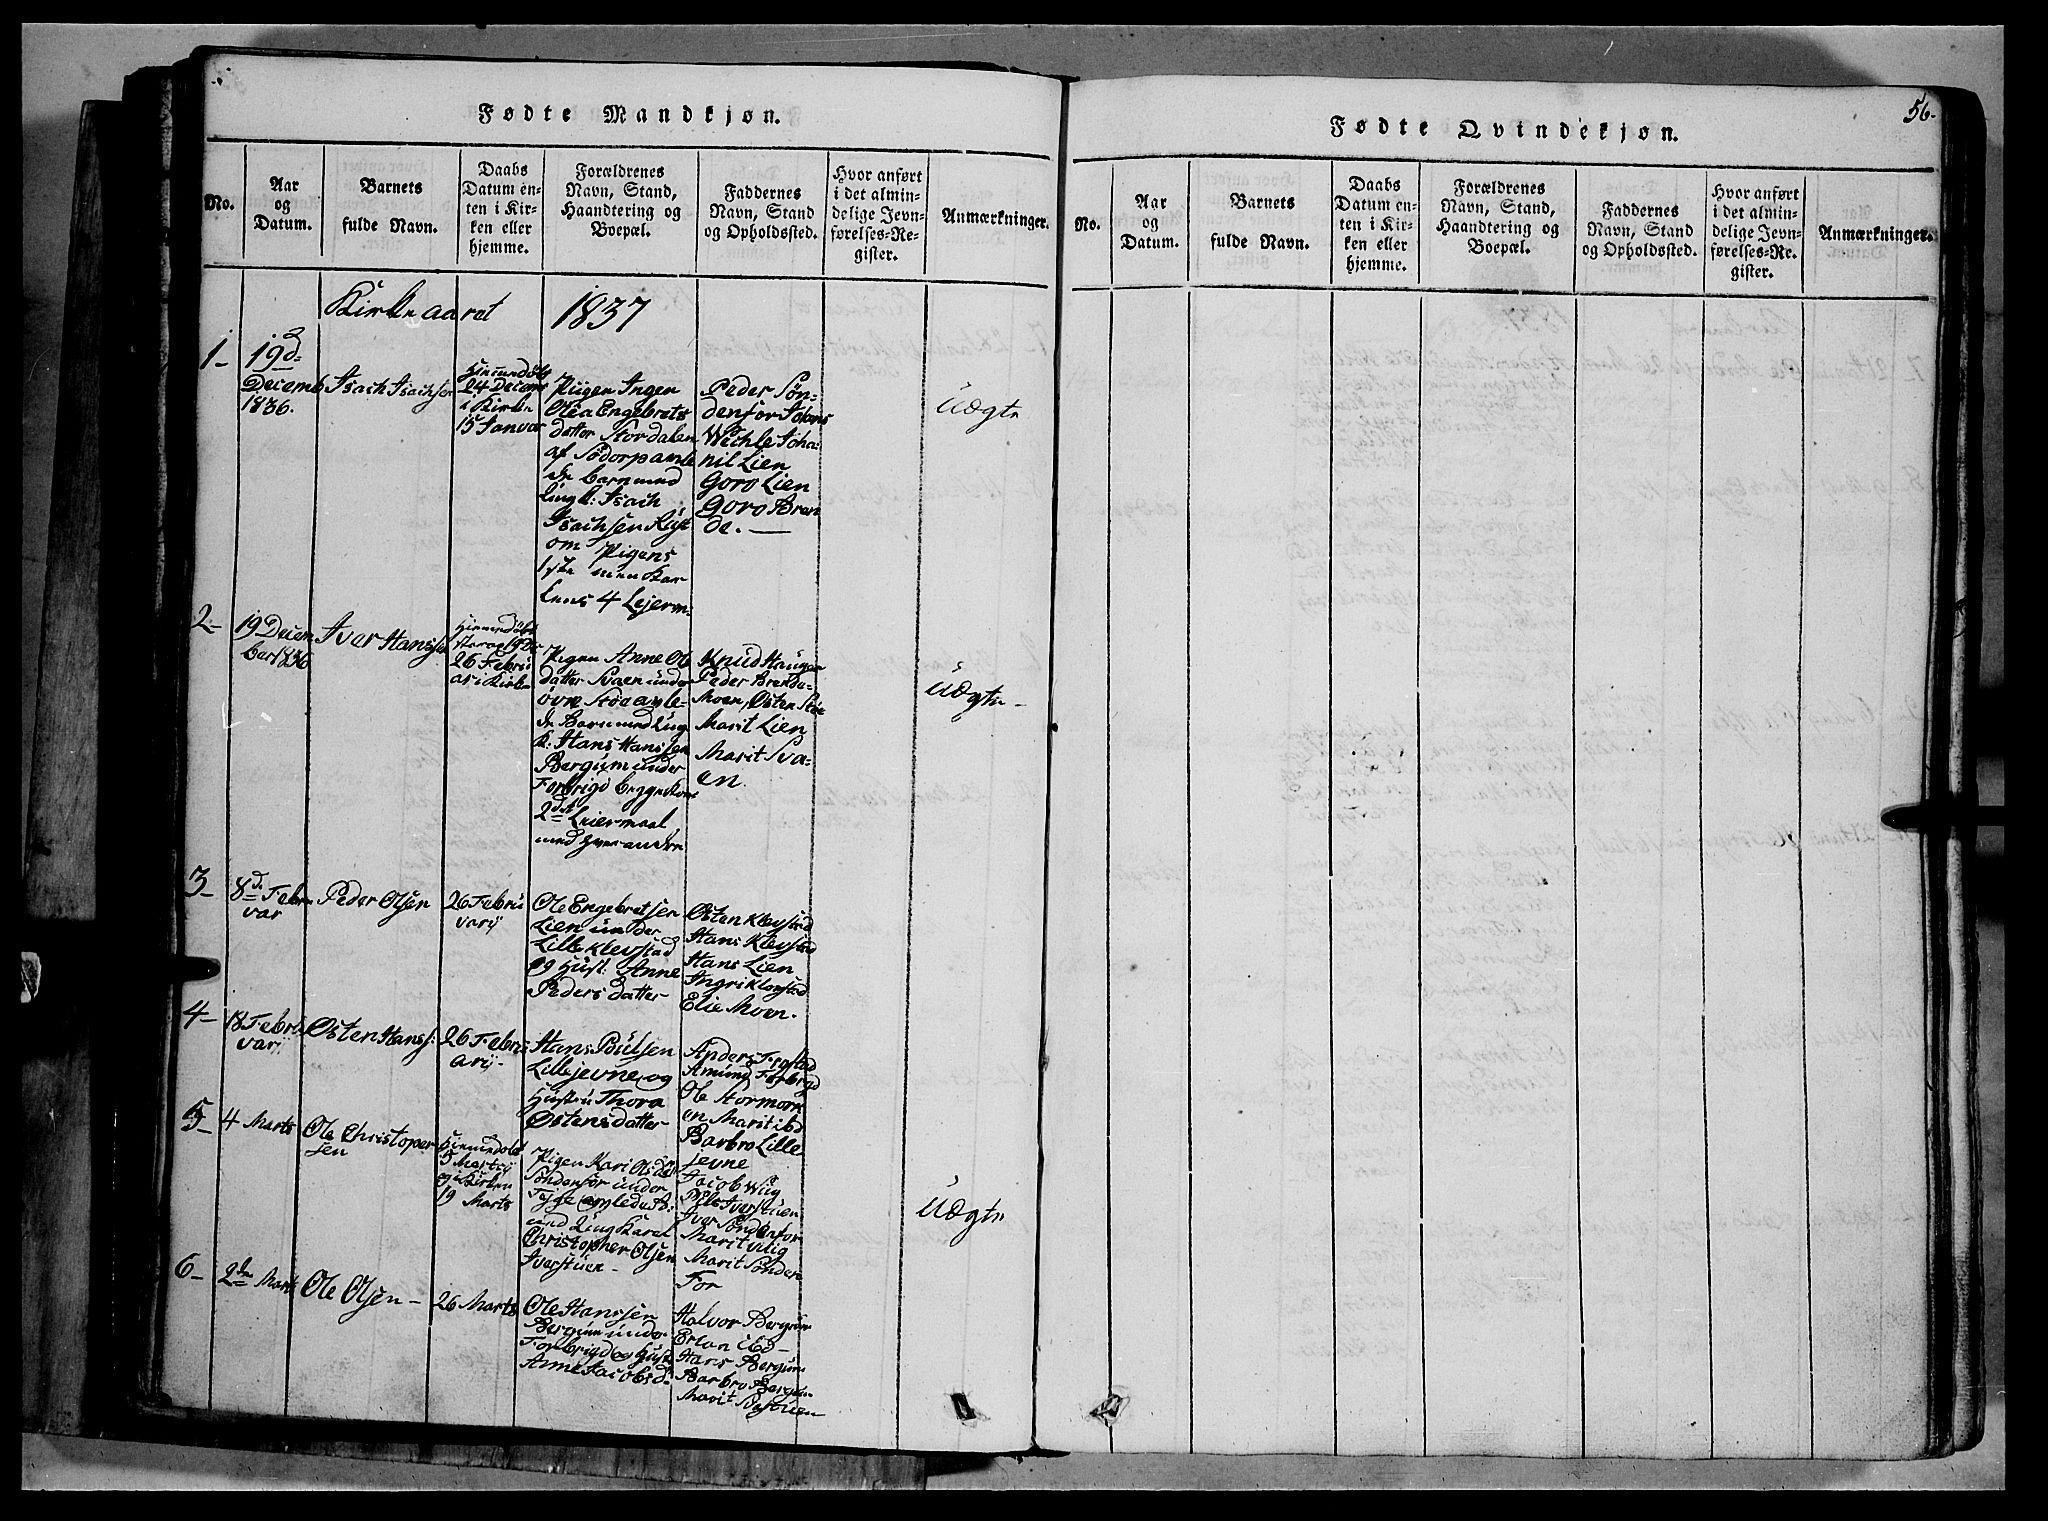 SAH, Fron prestekontor, H/Ha/Hab/L0002: Klokkerbok nr. 2, 1816-1850, s. 56